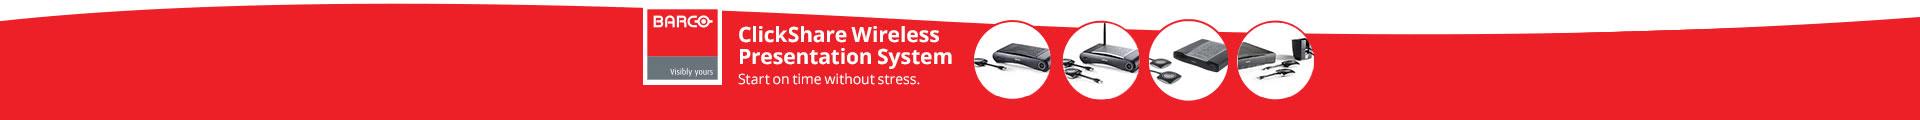 Click Share Wireless Presentation System